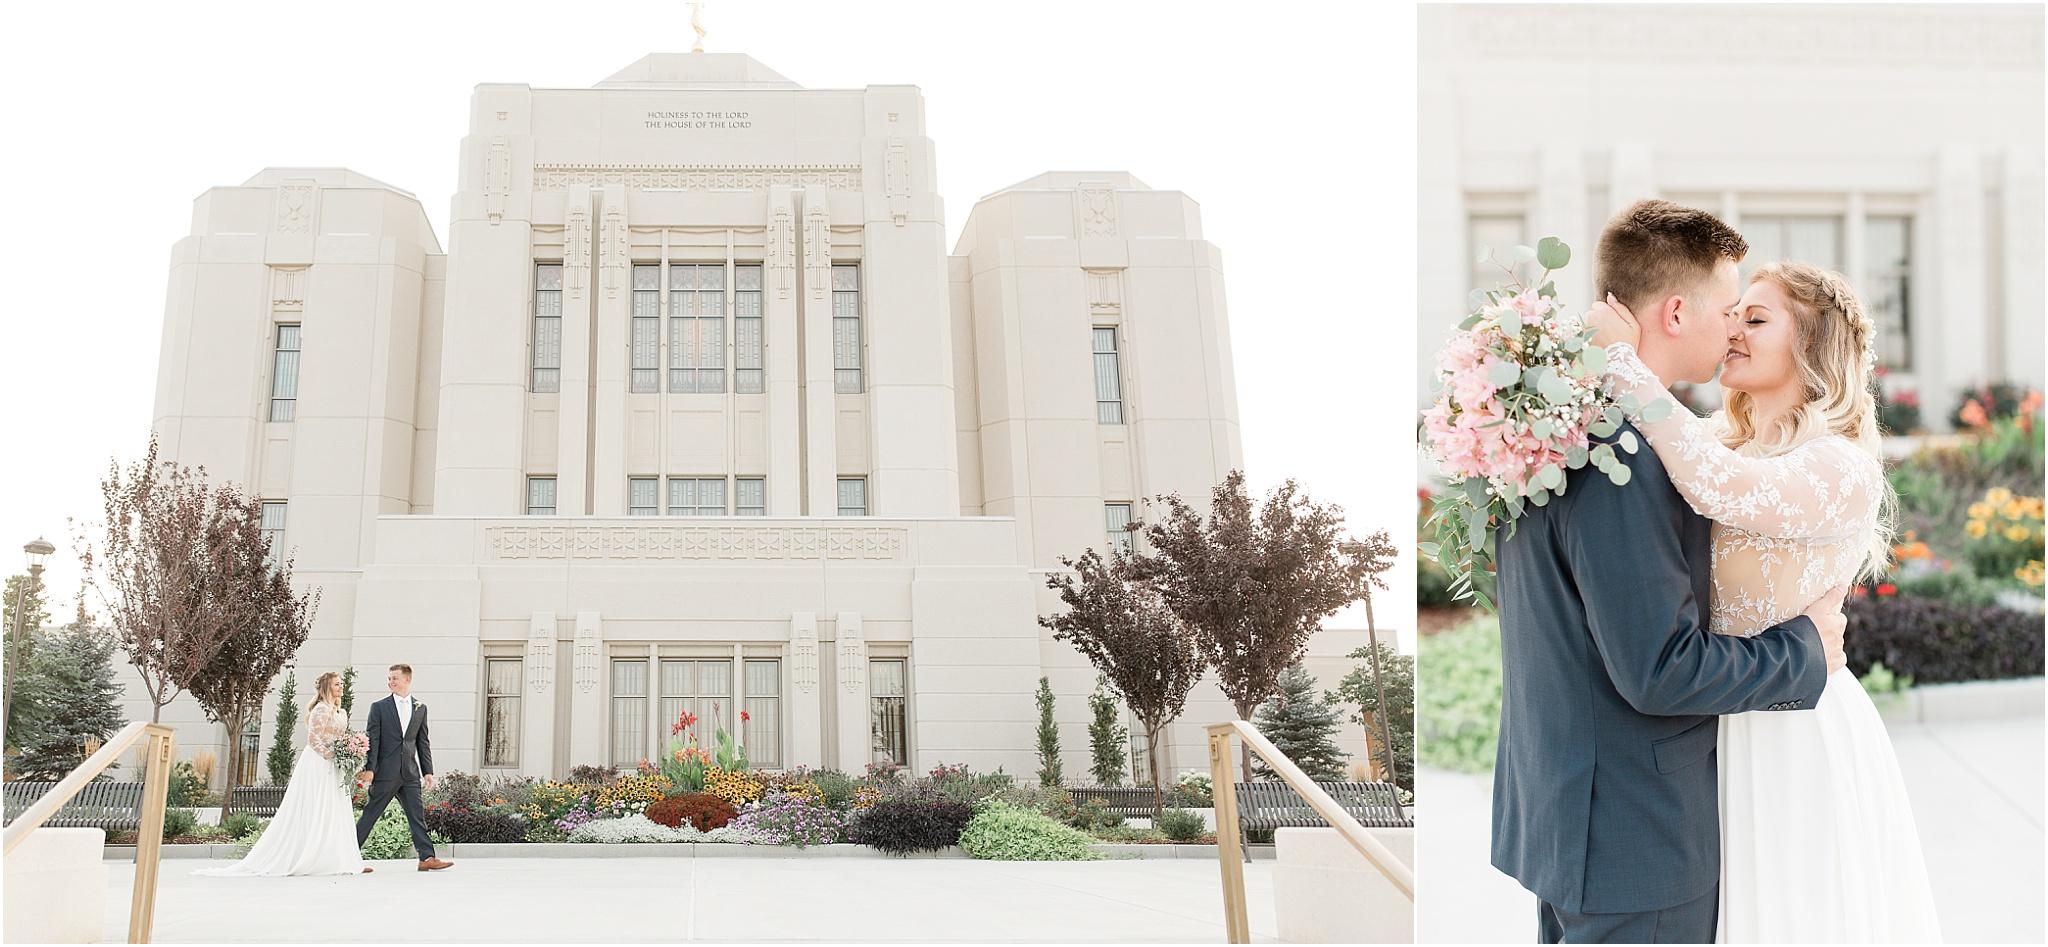 Wedding Photography_Meridian Idaho Temple_Boise Idaho_Nampa Idaho_Leah Southwick Photography_0003.jpg